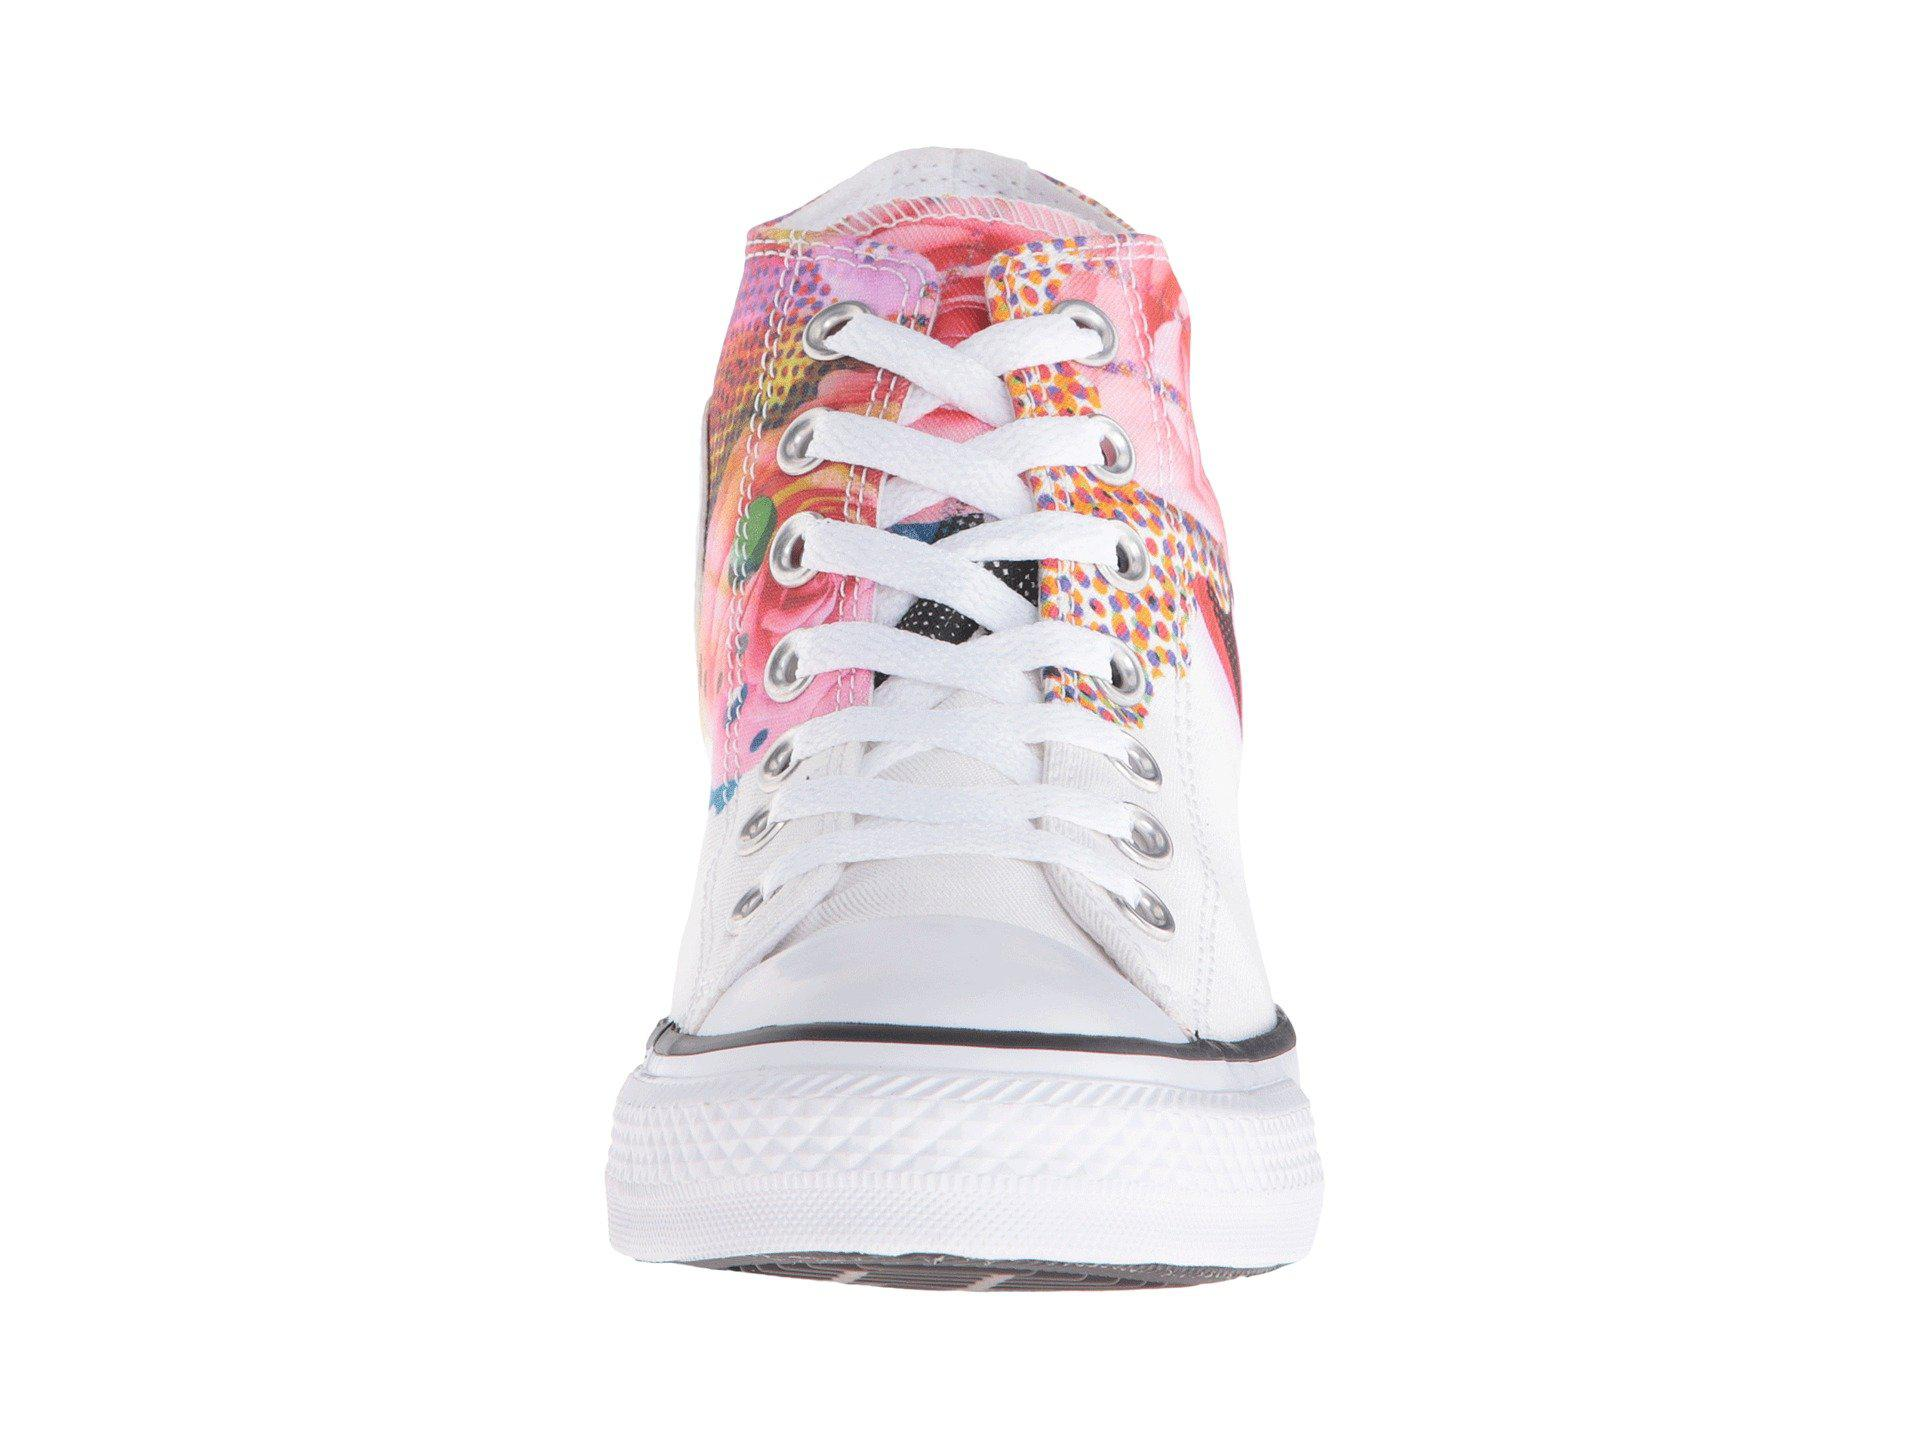 9b6de84c644d Lyst - Converse Chuck Taylor® All Star® Lux Digital Floral Print Mid ...